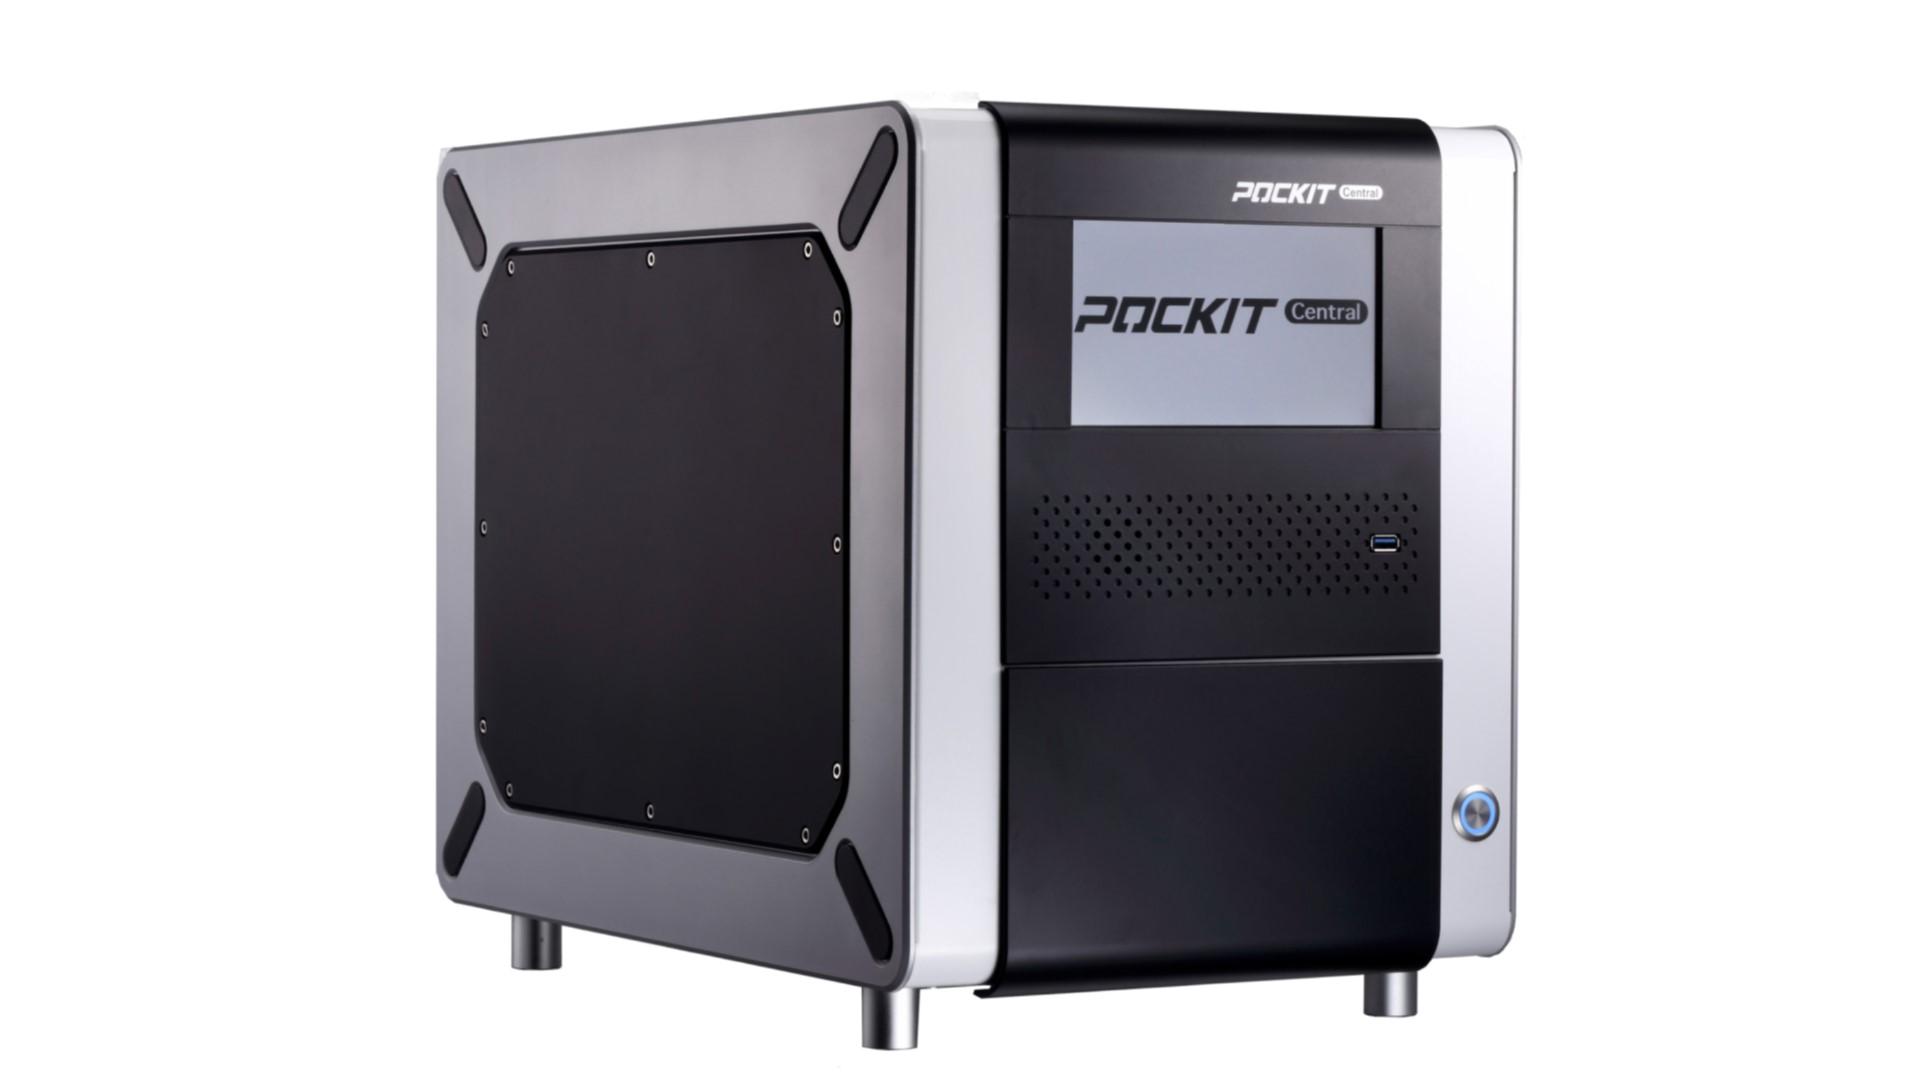 POCKIT Central Nucleic Acid Analyzer